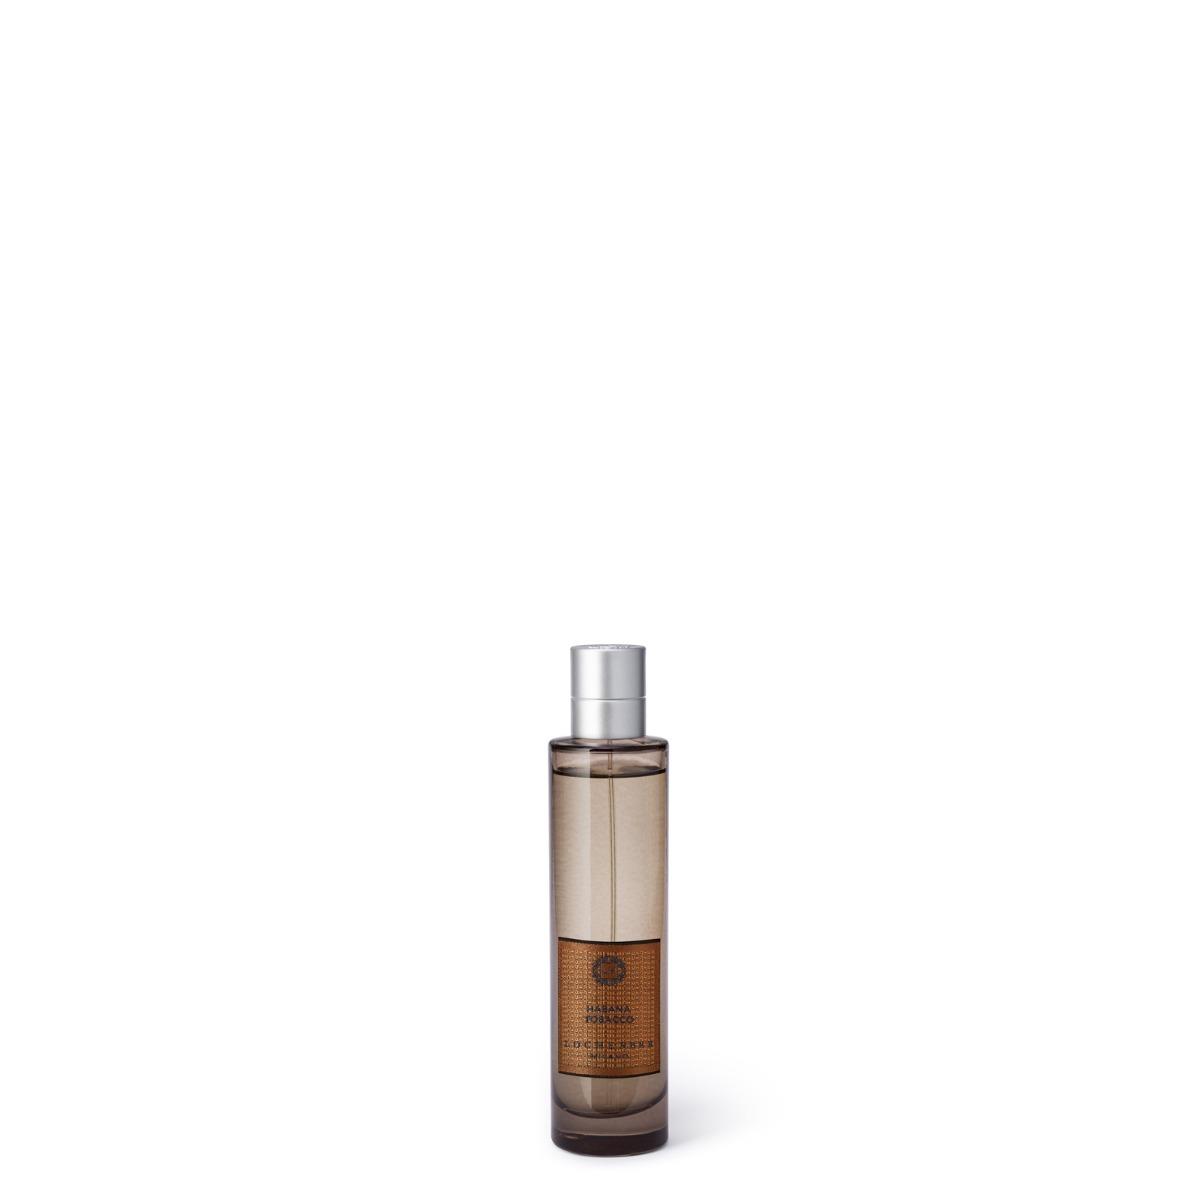 Dyfuzor zapachu spray Habana Tobacco 100ml Miloo Home LCH-440110